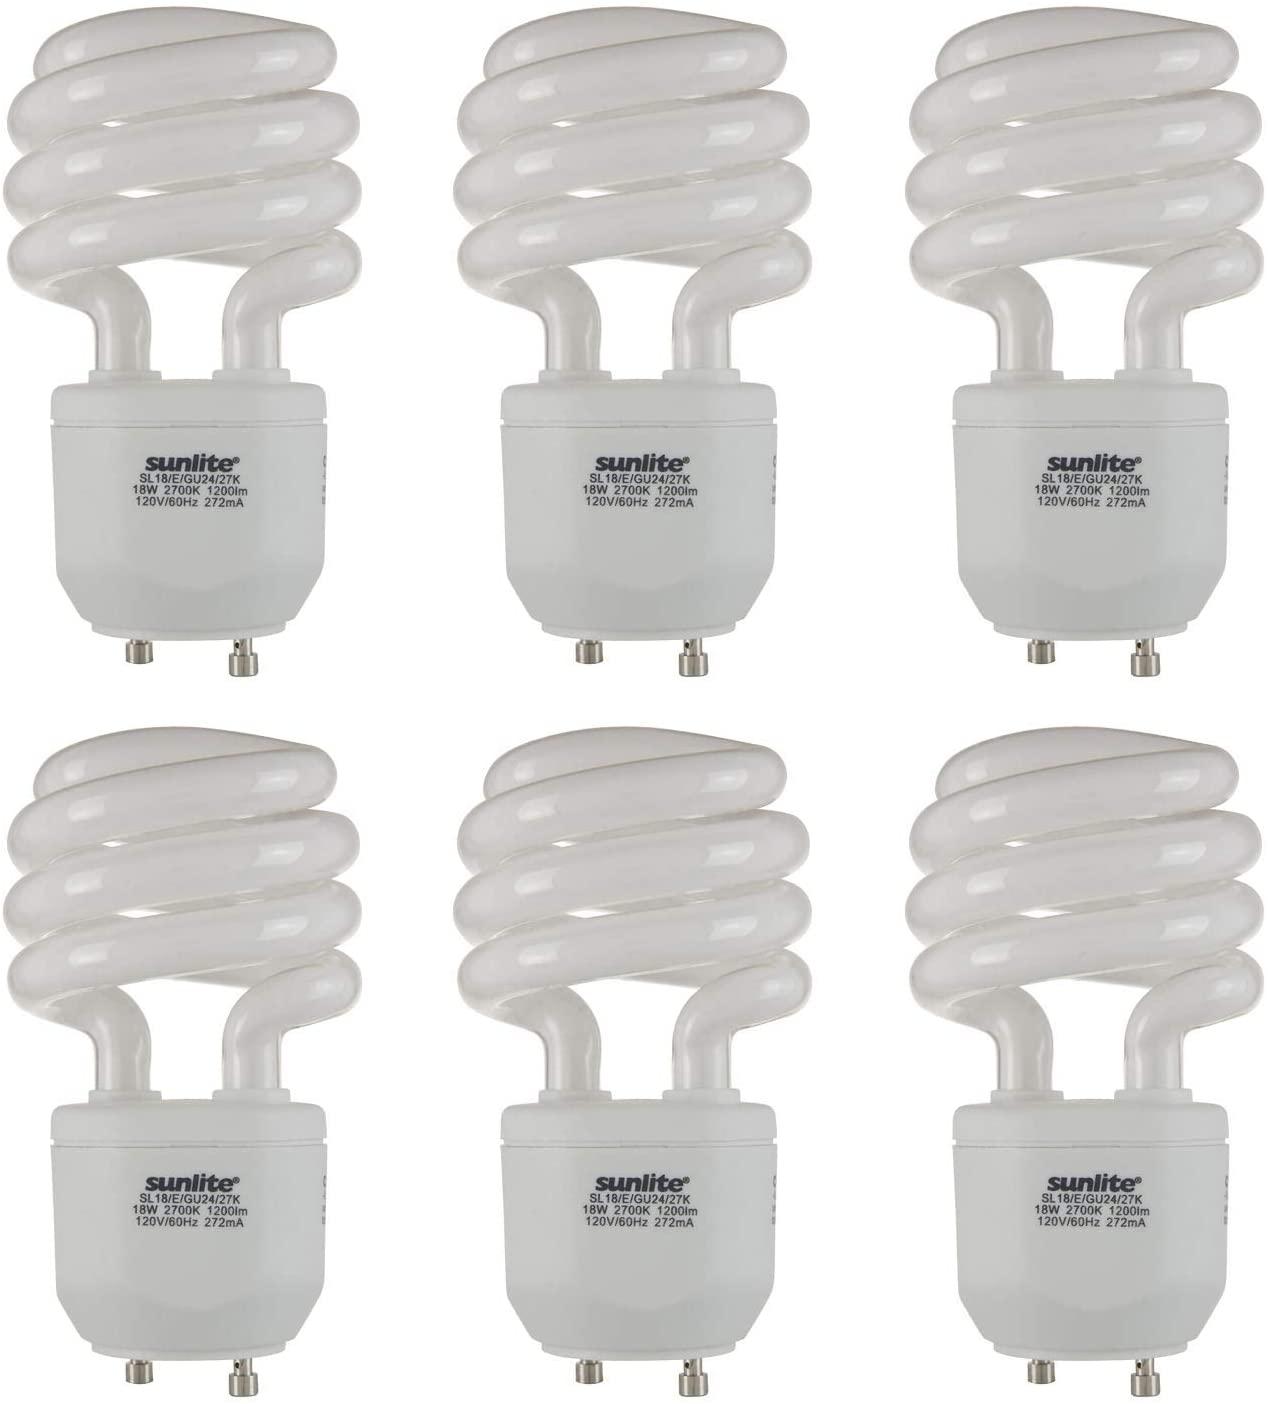 Sunlite 41154-SU Compact Fluorescent T2 Spiral Standard Household Energy Saving CFL Light Bulb, 18 Watt, (75W Eqivilant) GU24 Base, 27K-Warm White, 6 Pack